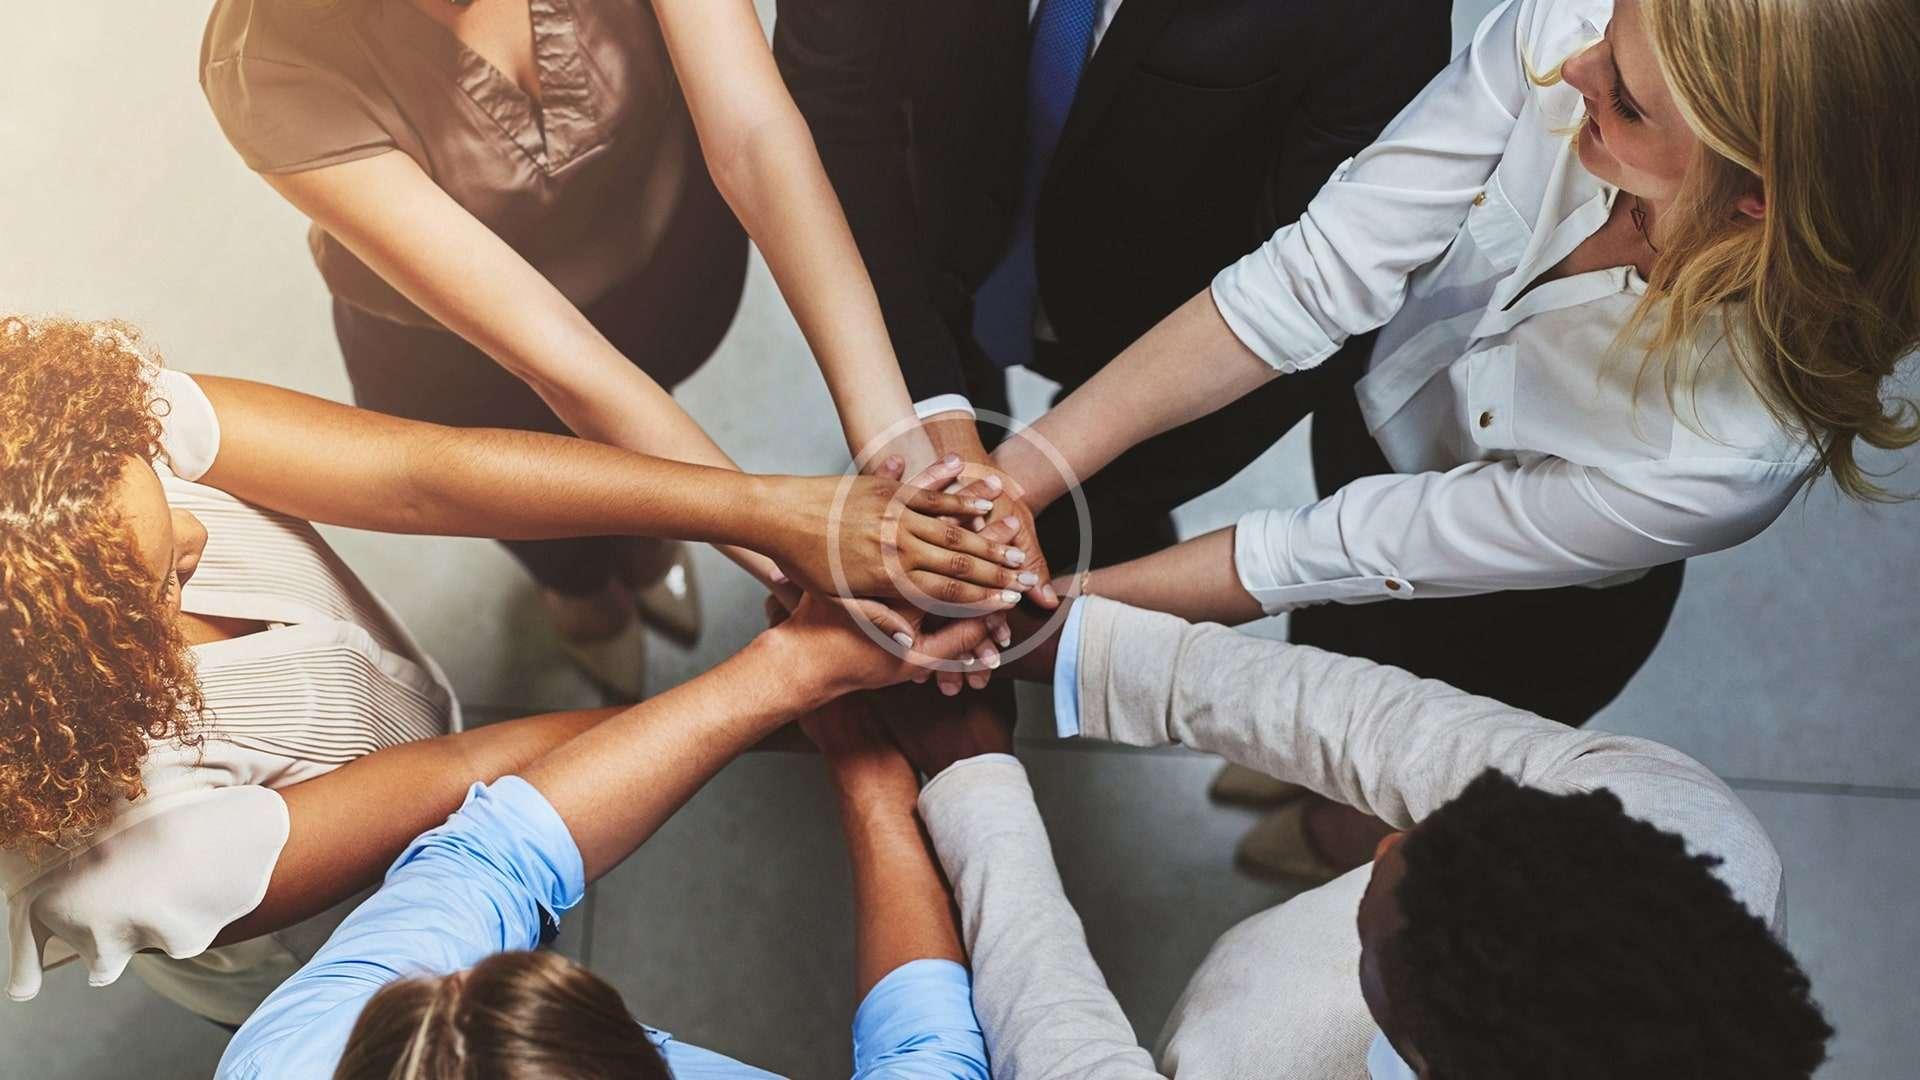 Basic Principles of Management & Team Work